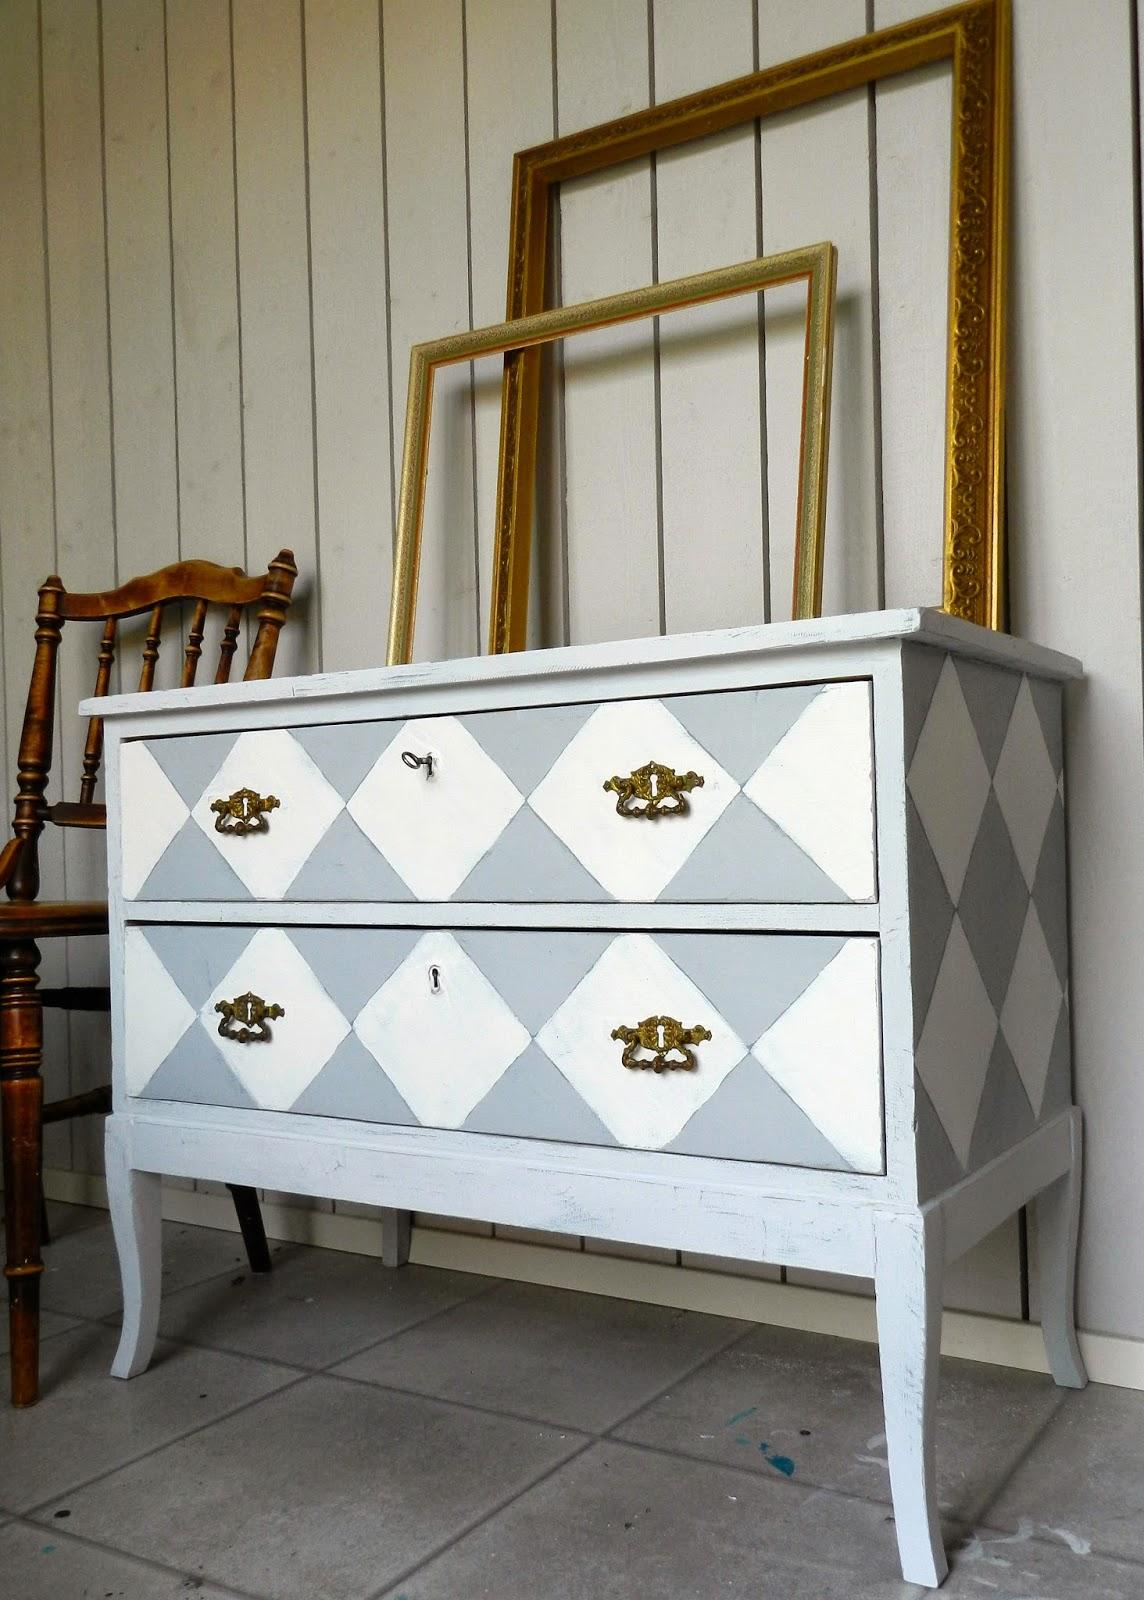 MÃ¥leriet: Möbler till salu : måla gamla möbler vita : Inredning